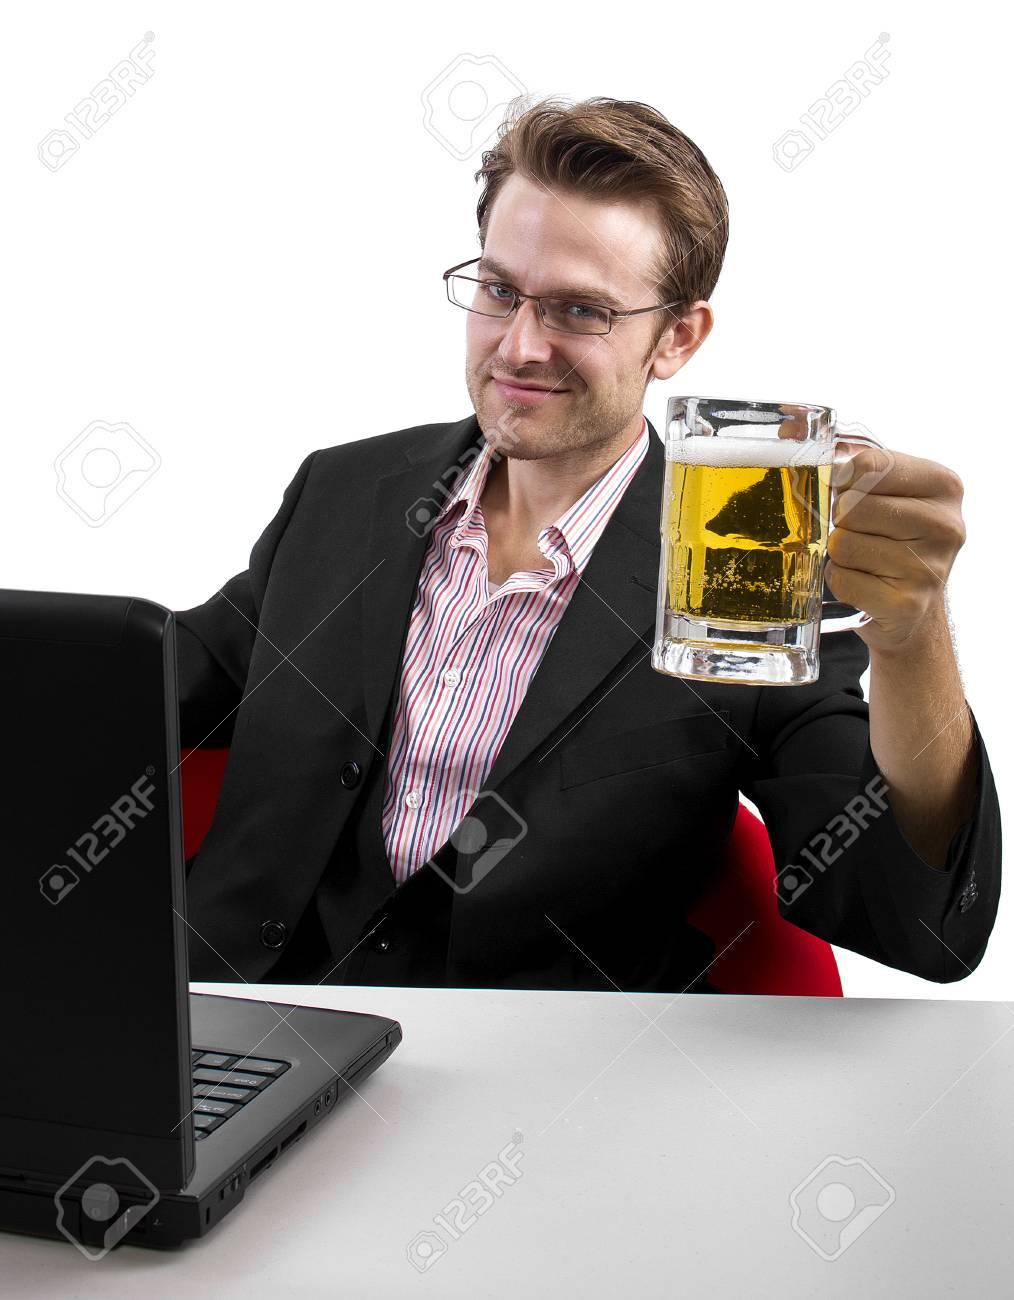 caucasian male using laptop on white background Stock Photo - 24249699